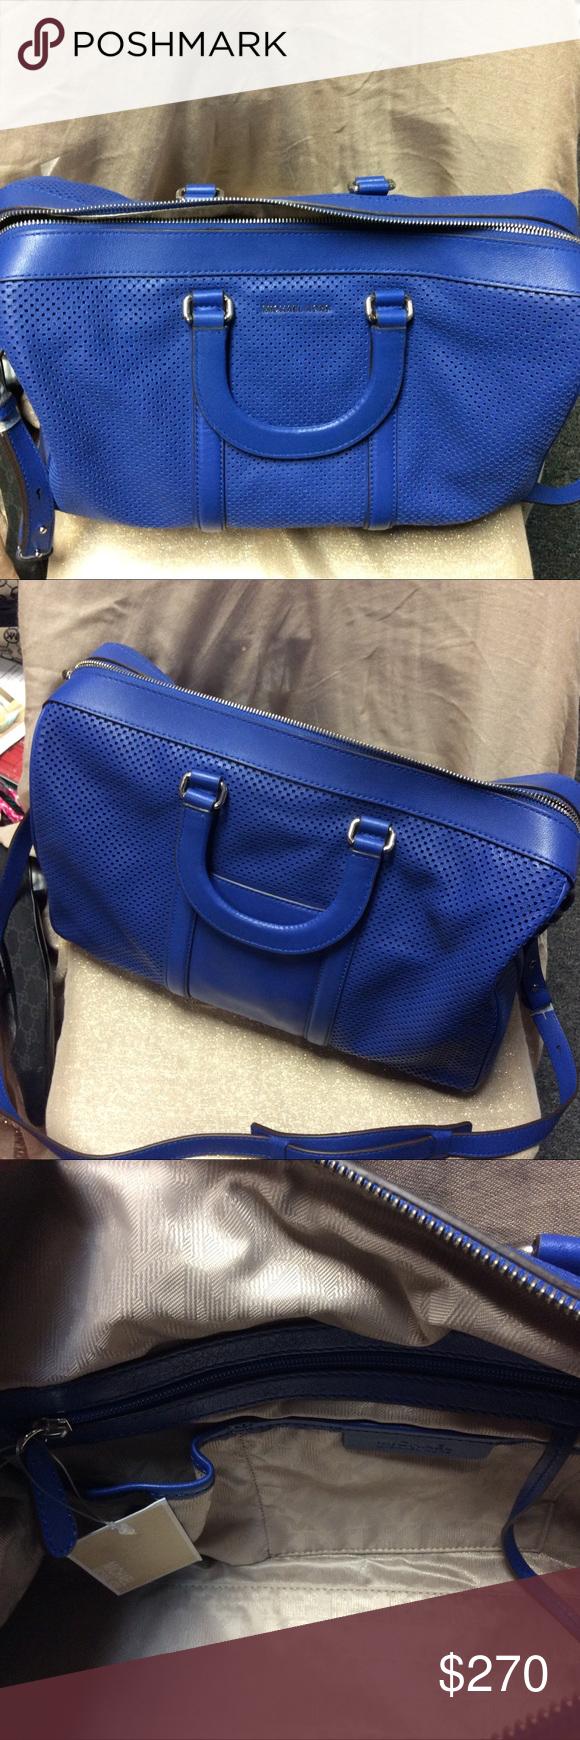 6cd3a6c7b4e9d4 Michael Kors BLUE LEATHER GYM BAG!! Michael Kors Libby Large Perforated  Leather Gym Bag